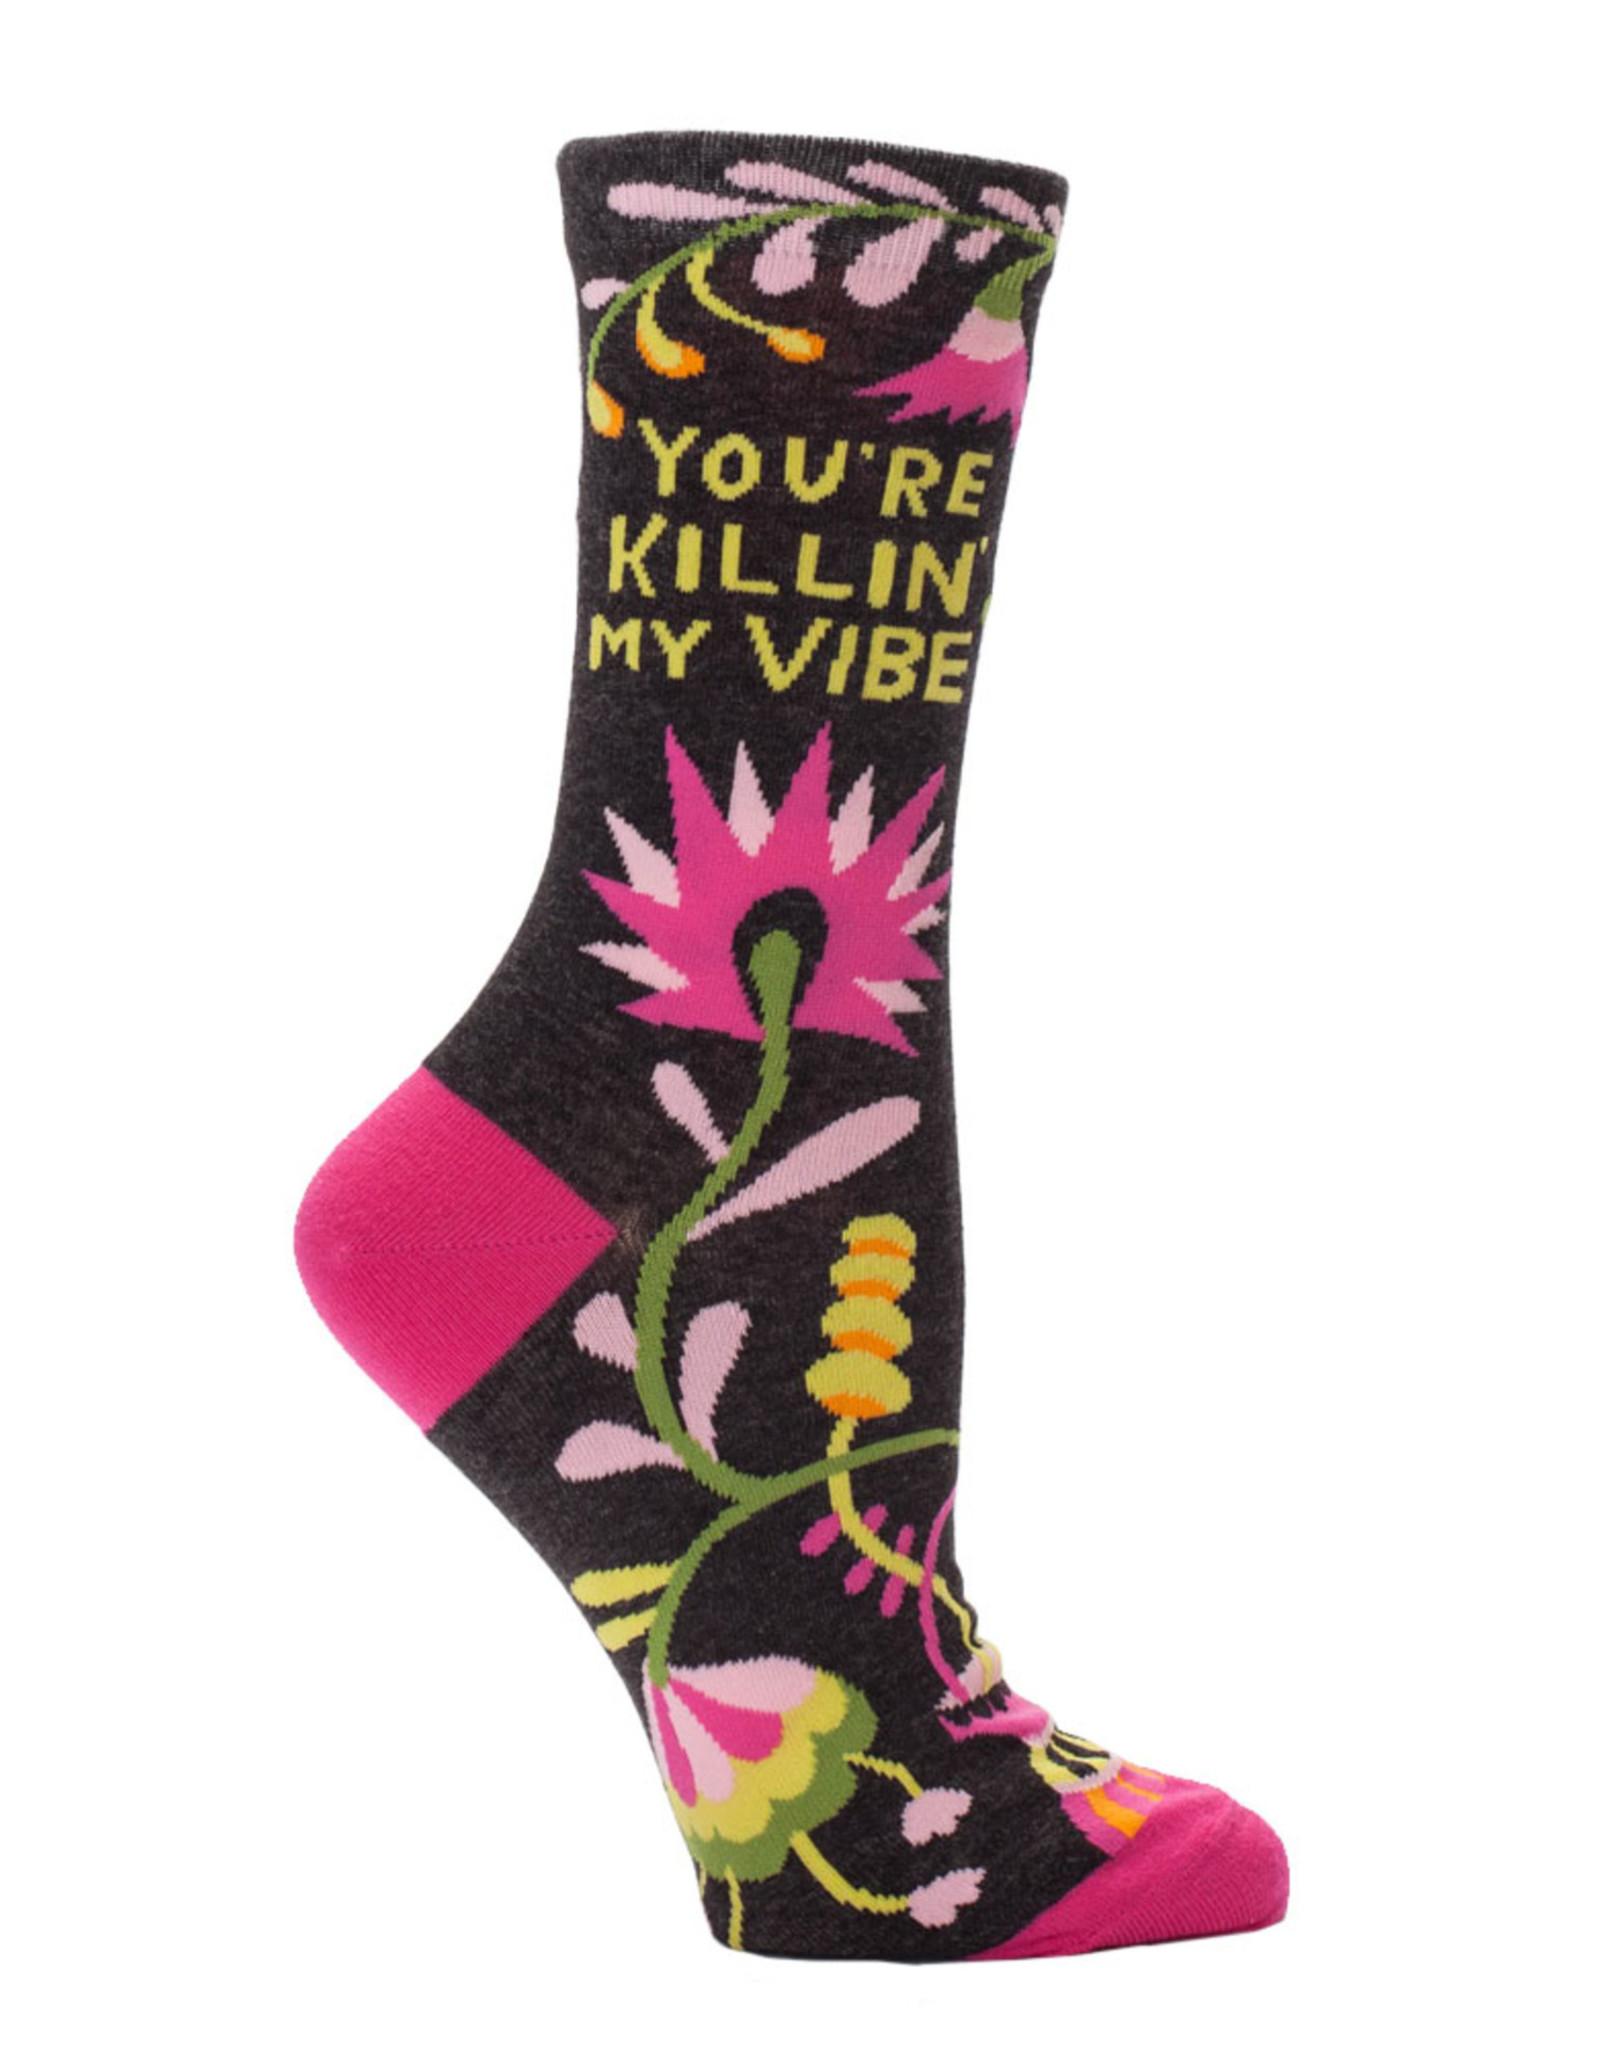 Blue Q Womens Socks - You're Killin My Vibe